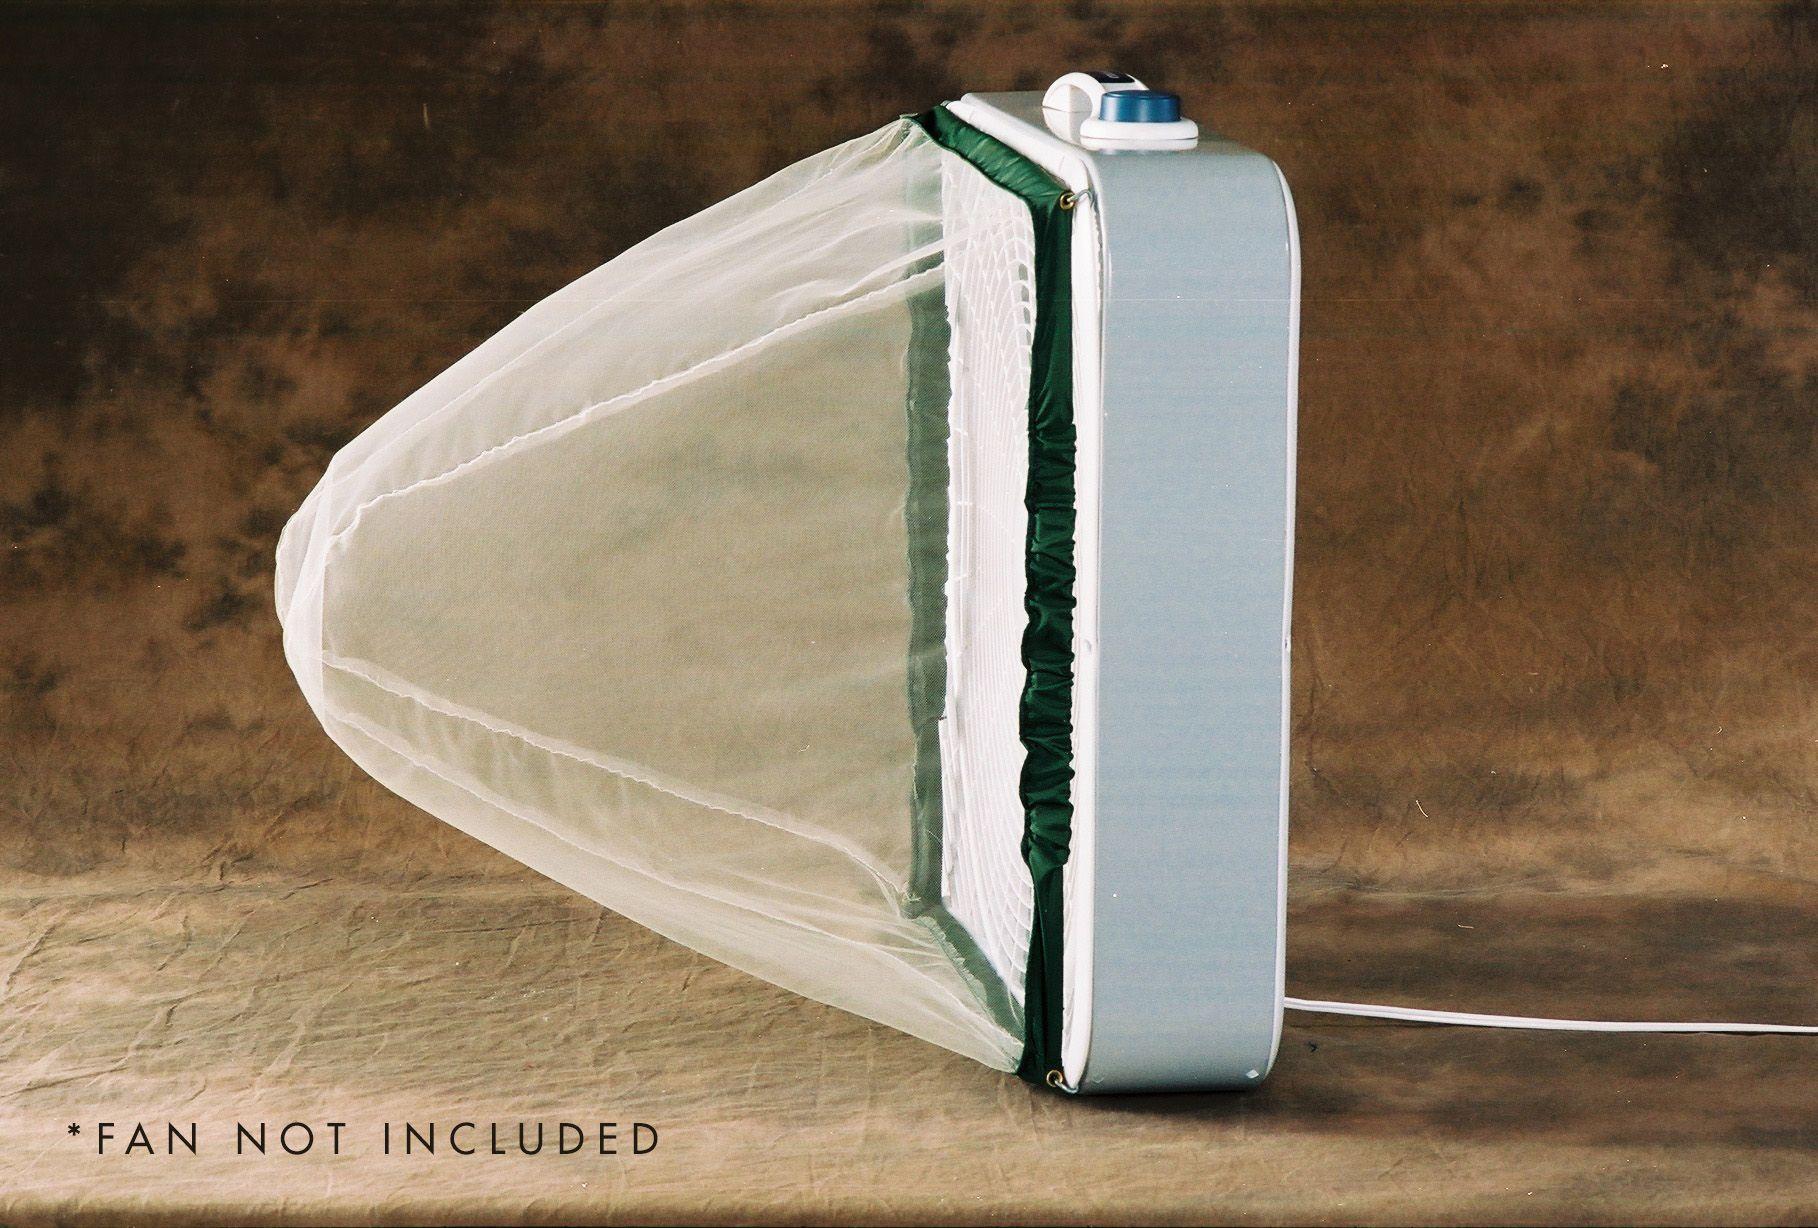 Skeeterbag Mosquito Trap Kits Mosquito Trap Mosquito Control Mosquito